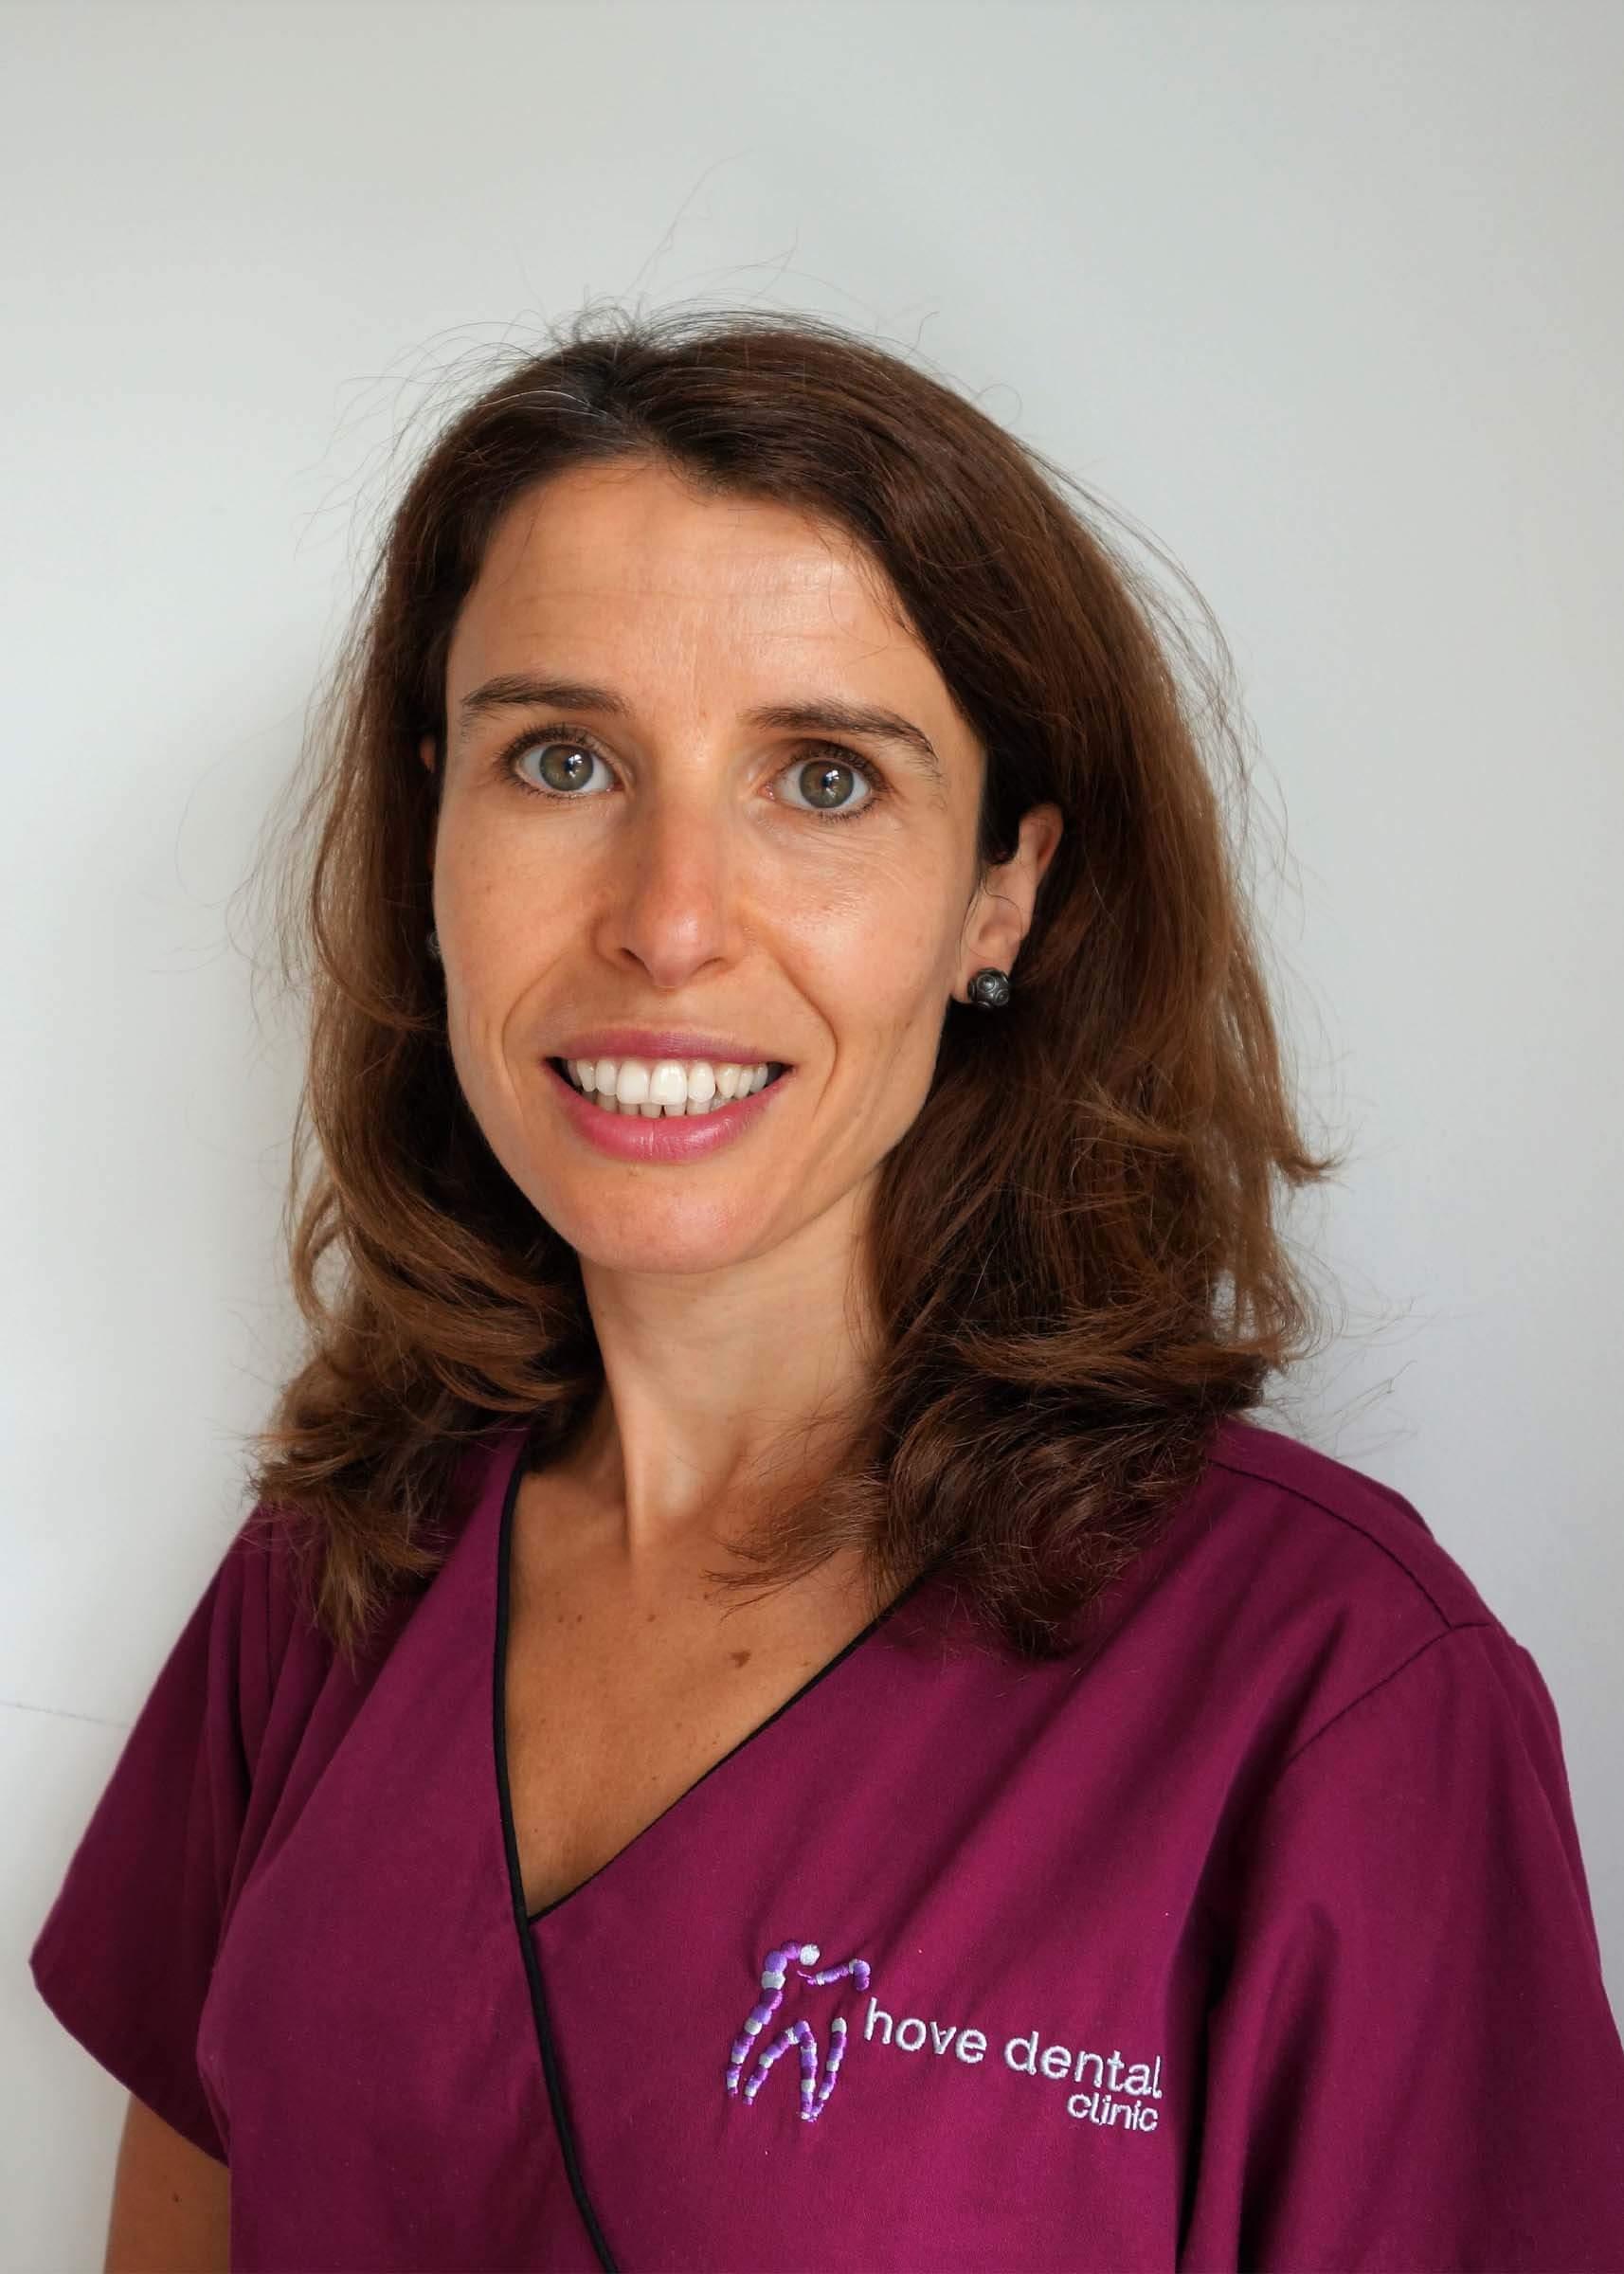 Ana Sousa Surwald